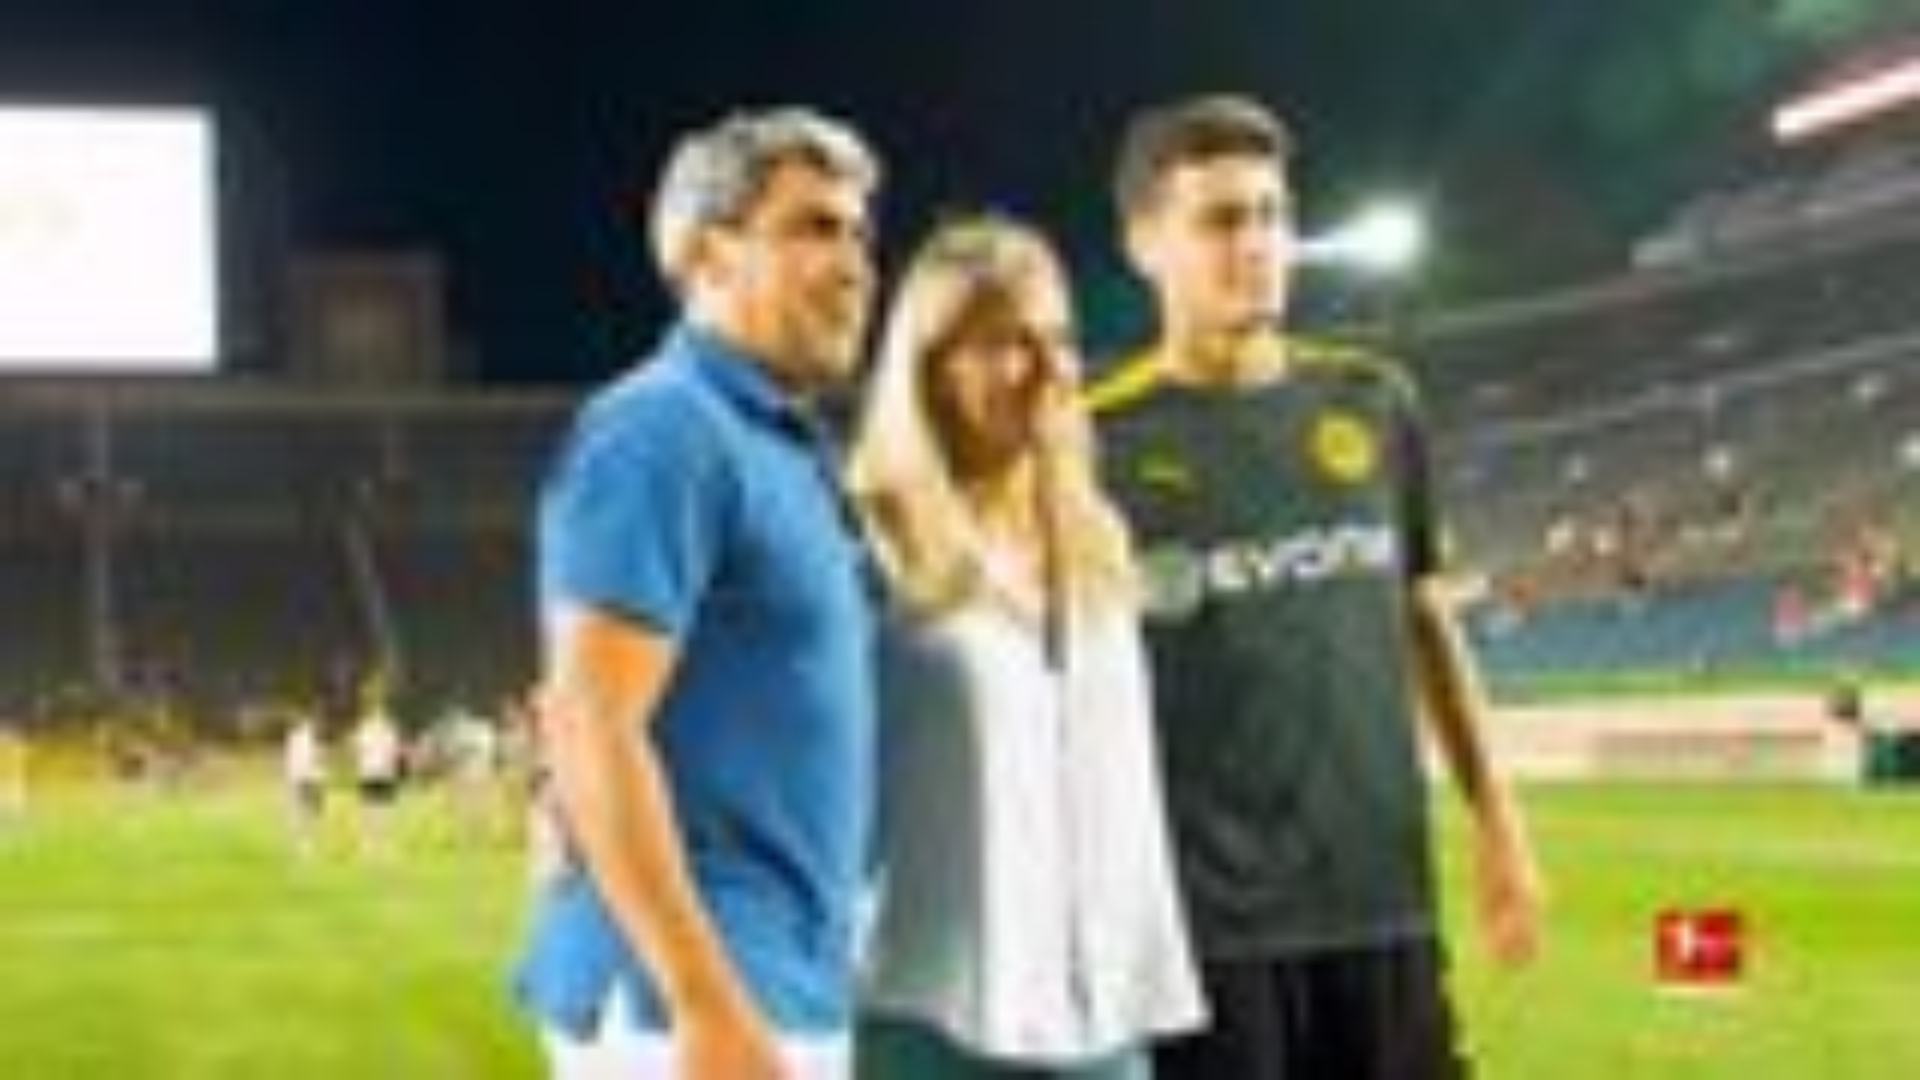 Gio Reyna: like father - and mother - like son